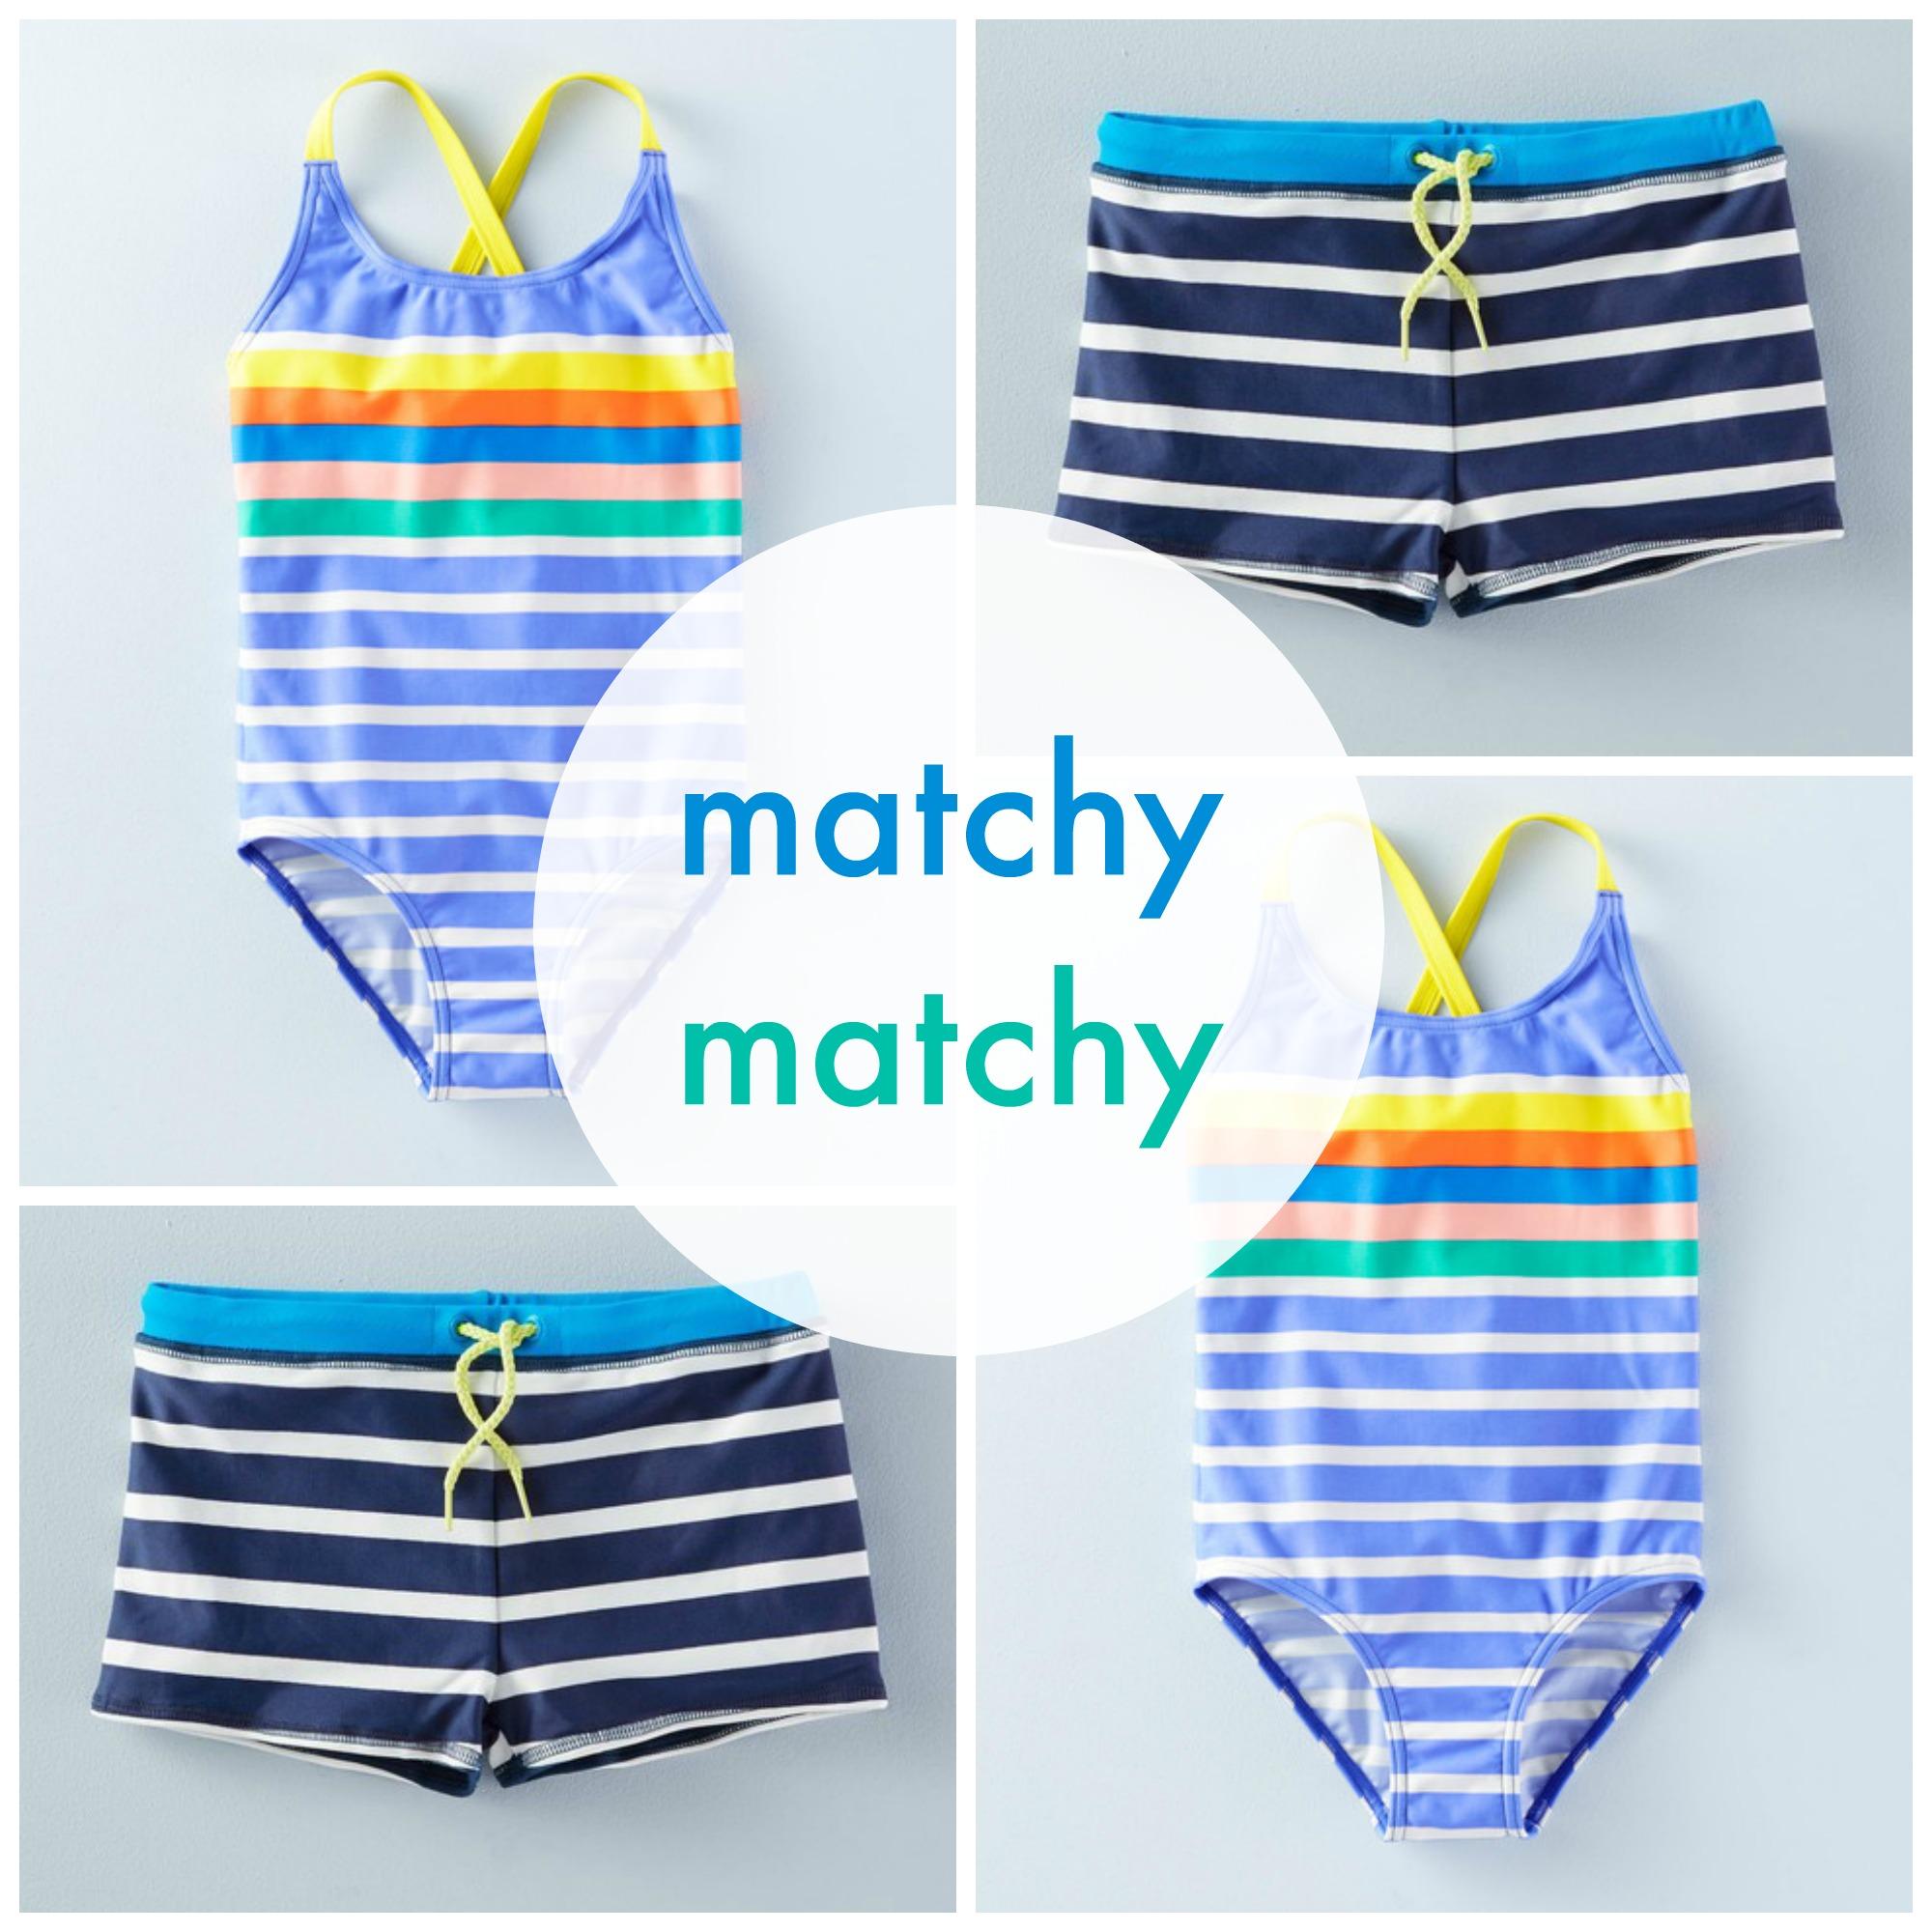 matchy